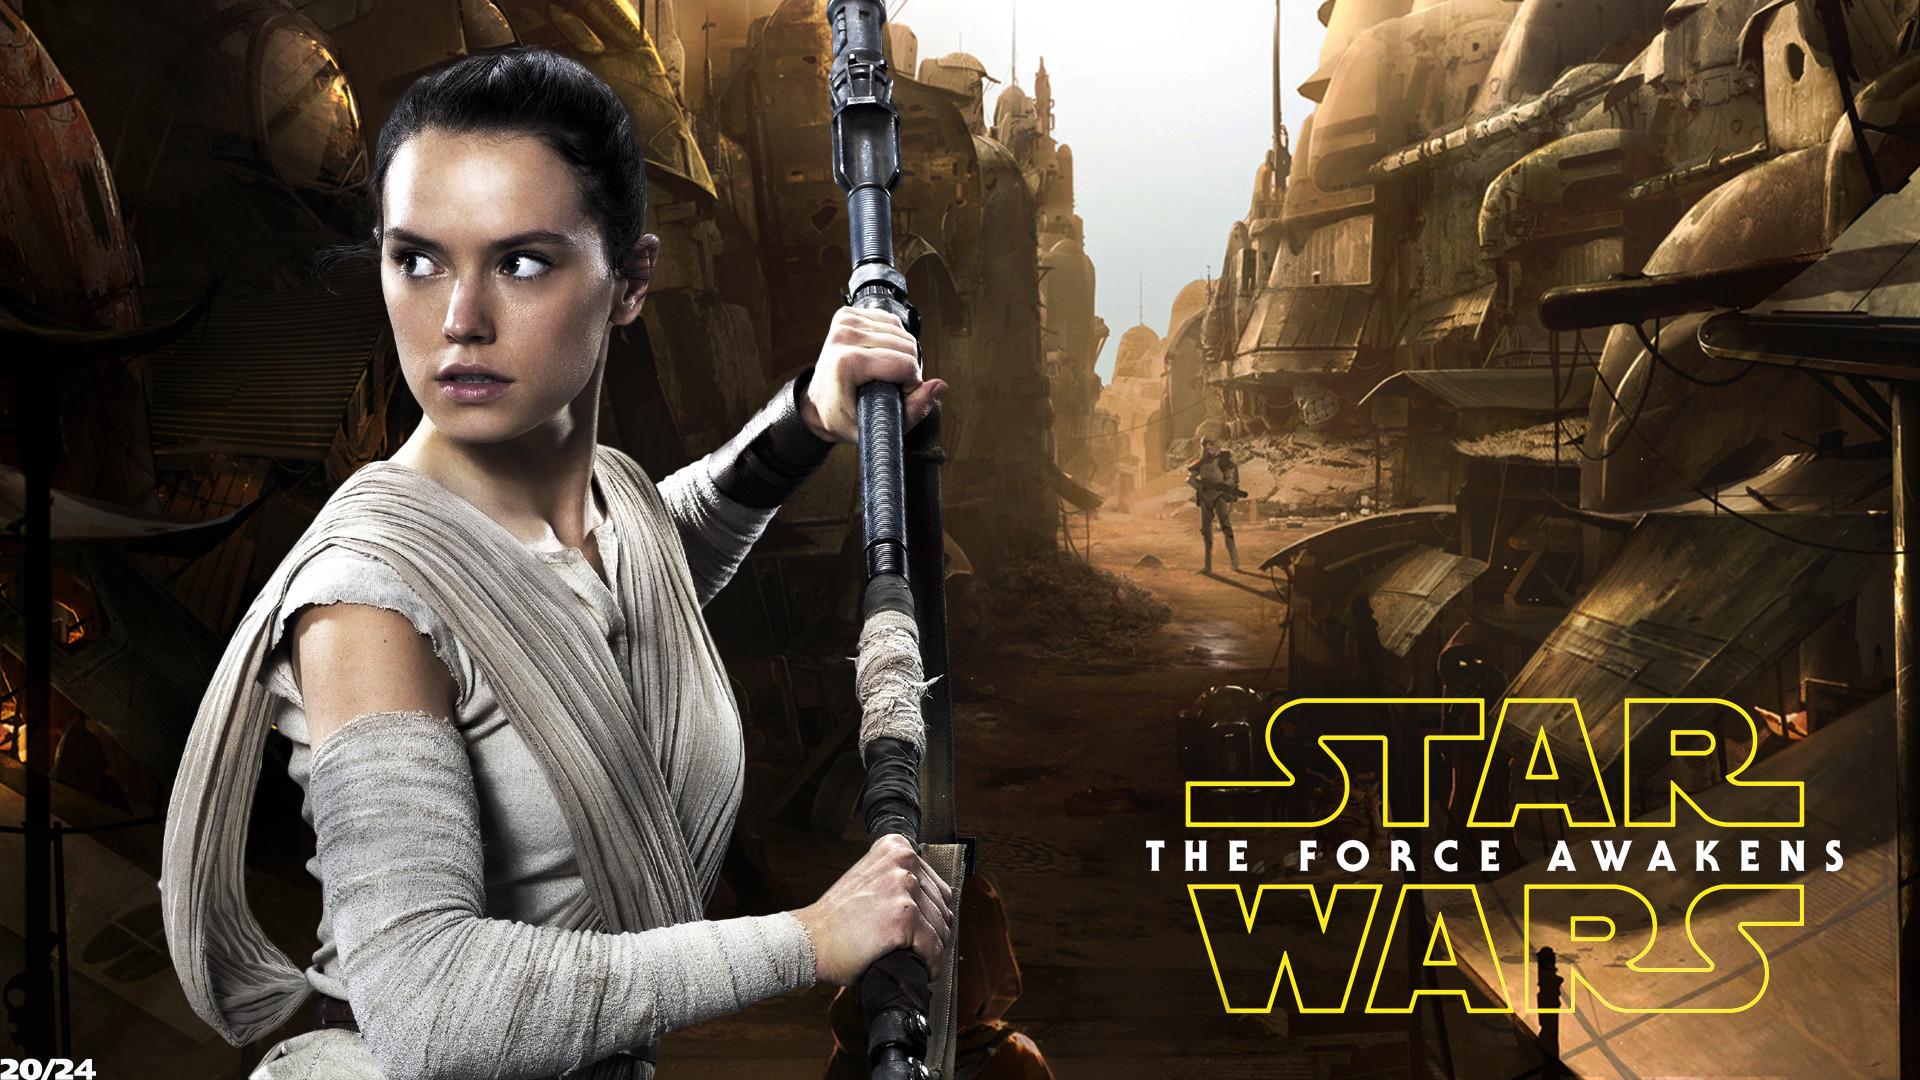 Daisy Ridley Star Wars Wallpaper: Rey Star Wars Wallpaper (74+ Images